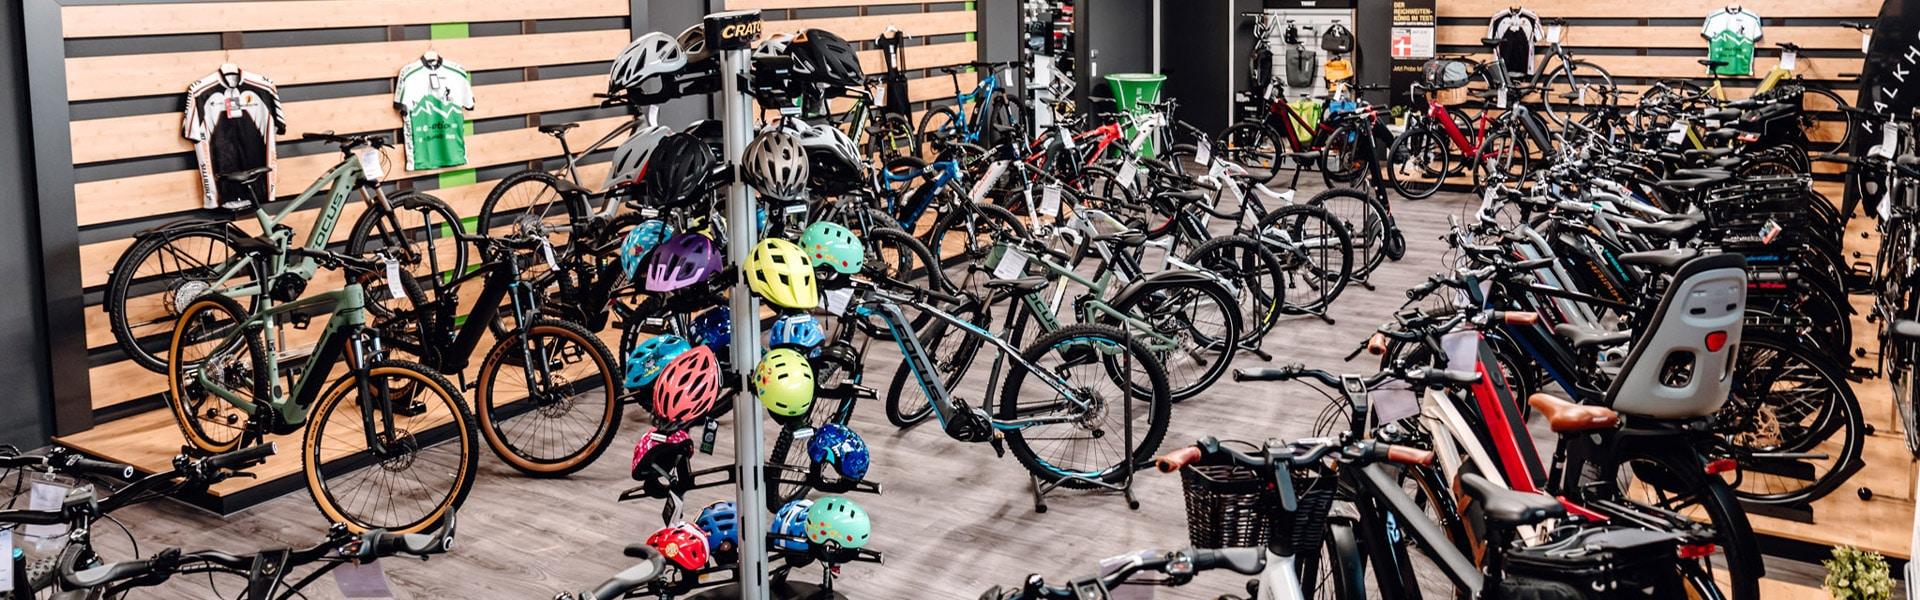 Der Shop der e-motion e-Bike Welt Harz